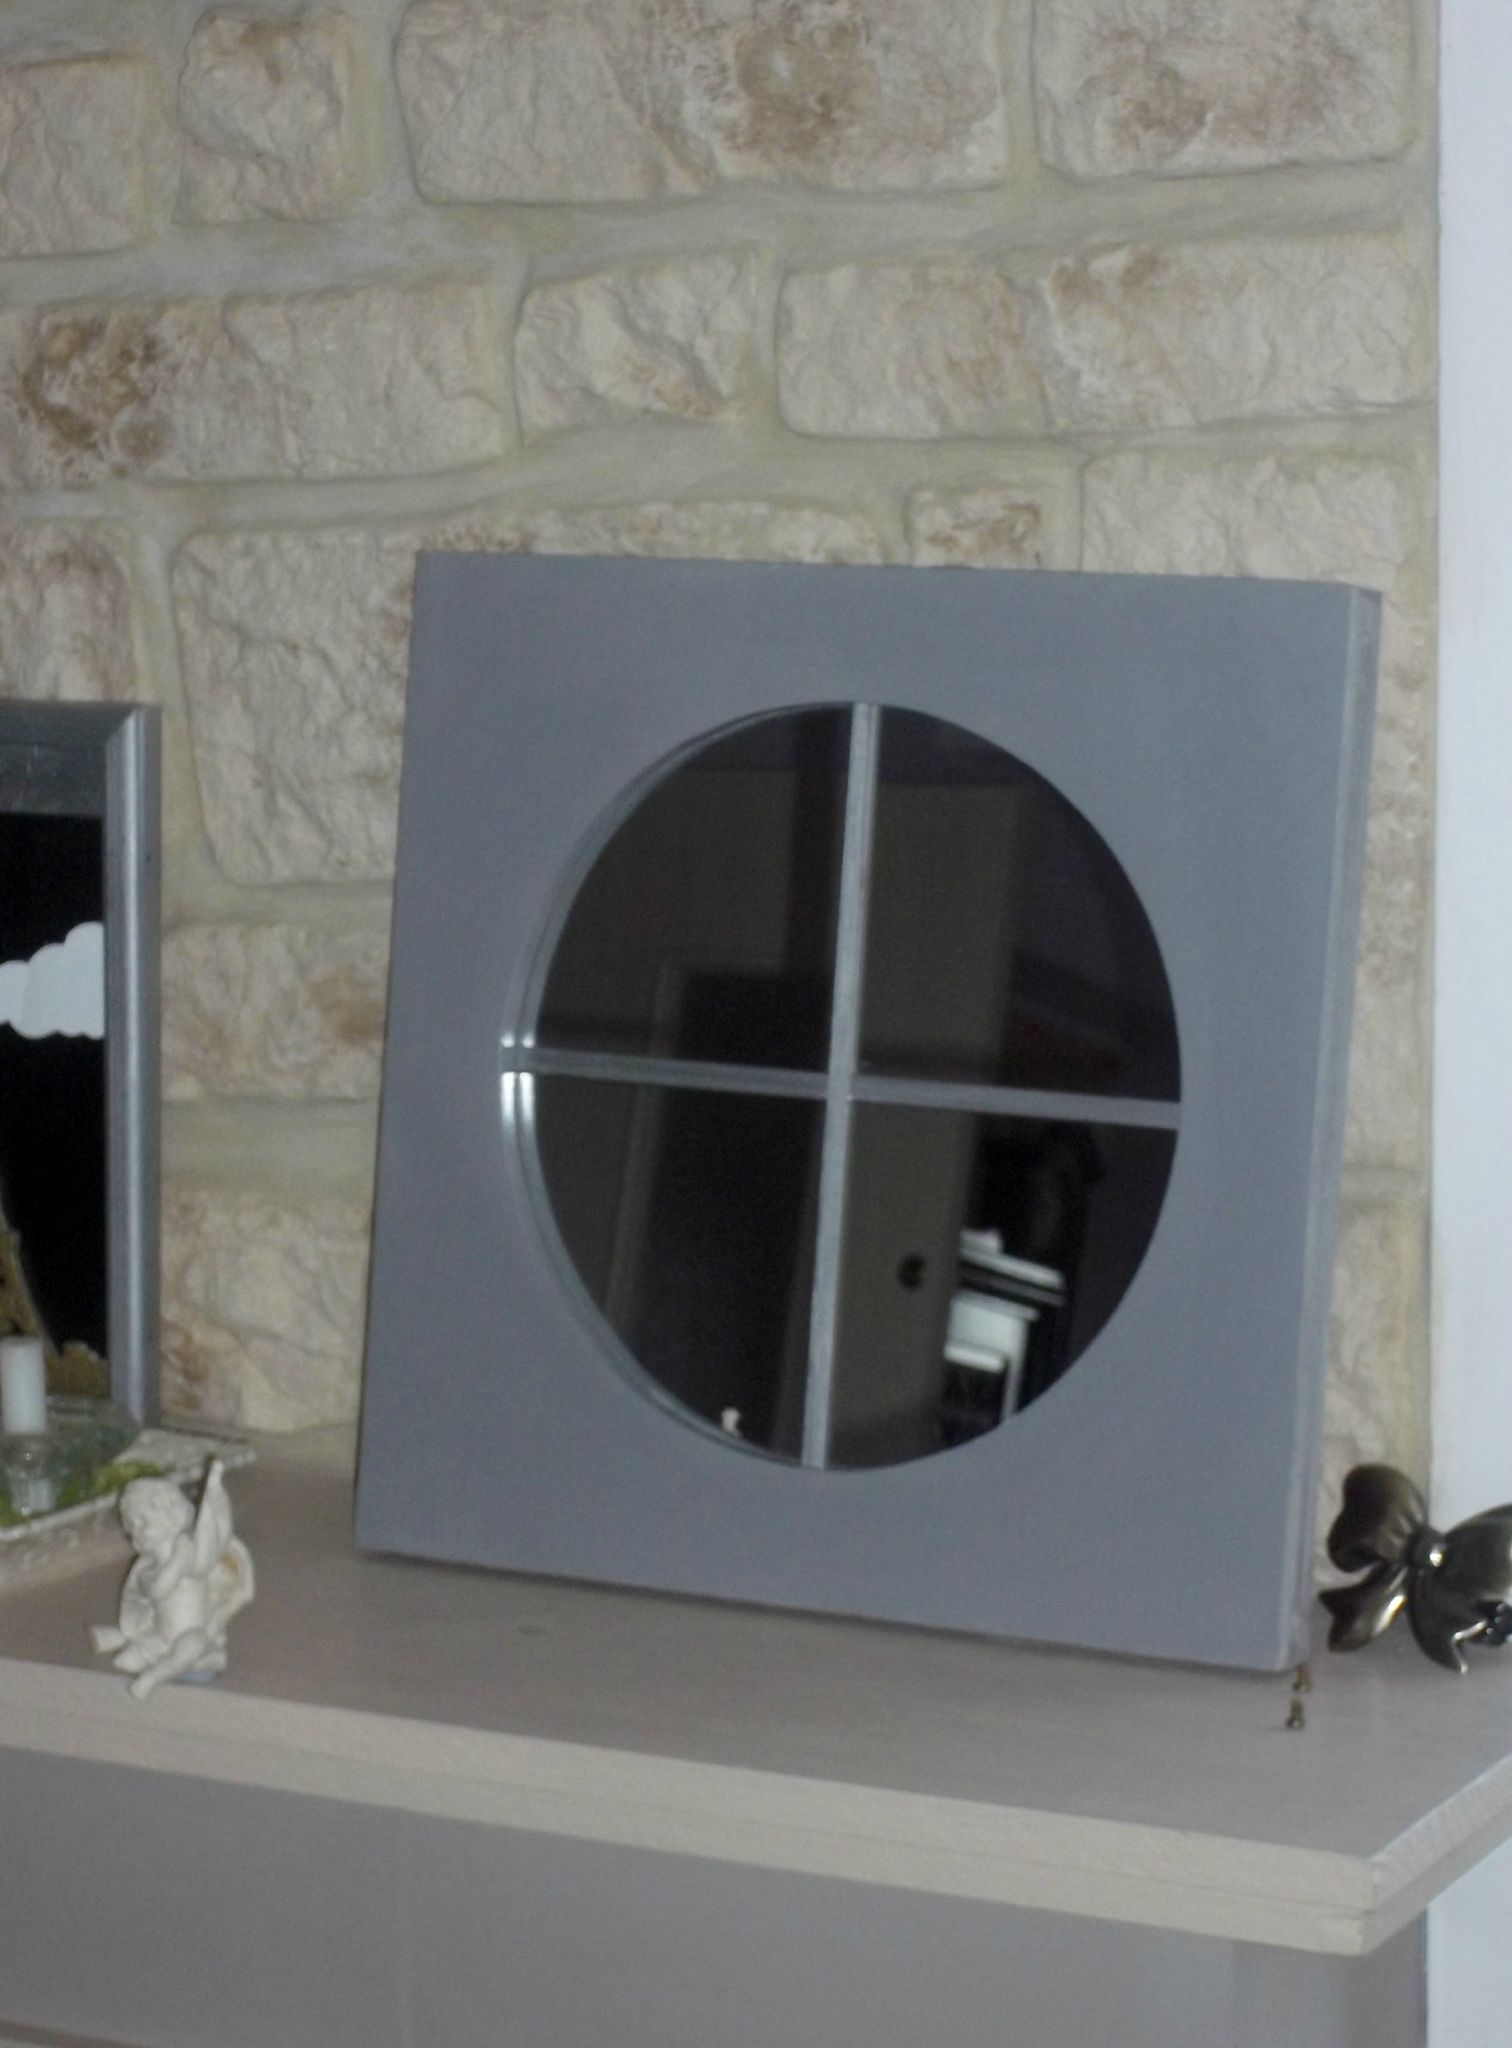 oeil de boeuf miroir crasville deco chantournage. Black Bedroom Furniture Sets. Home Design Ideas